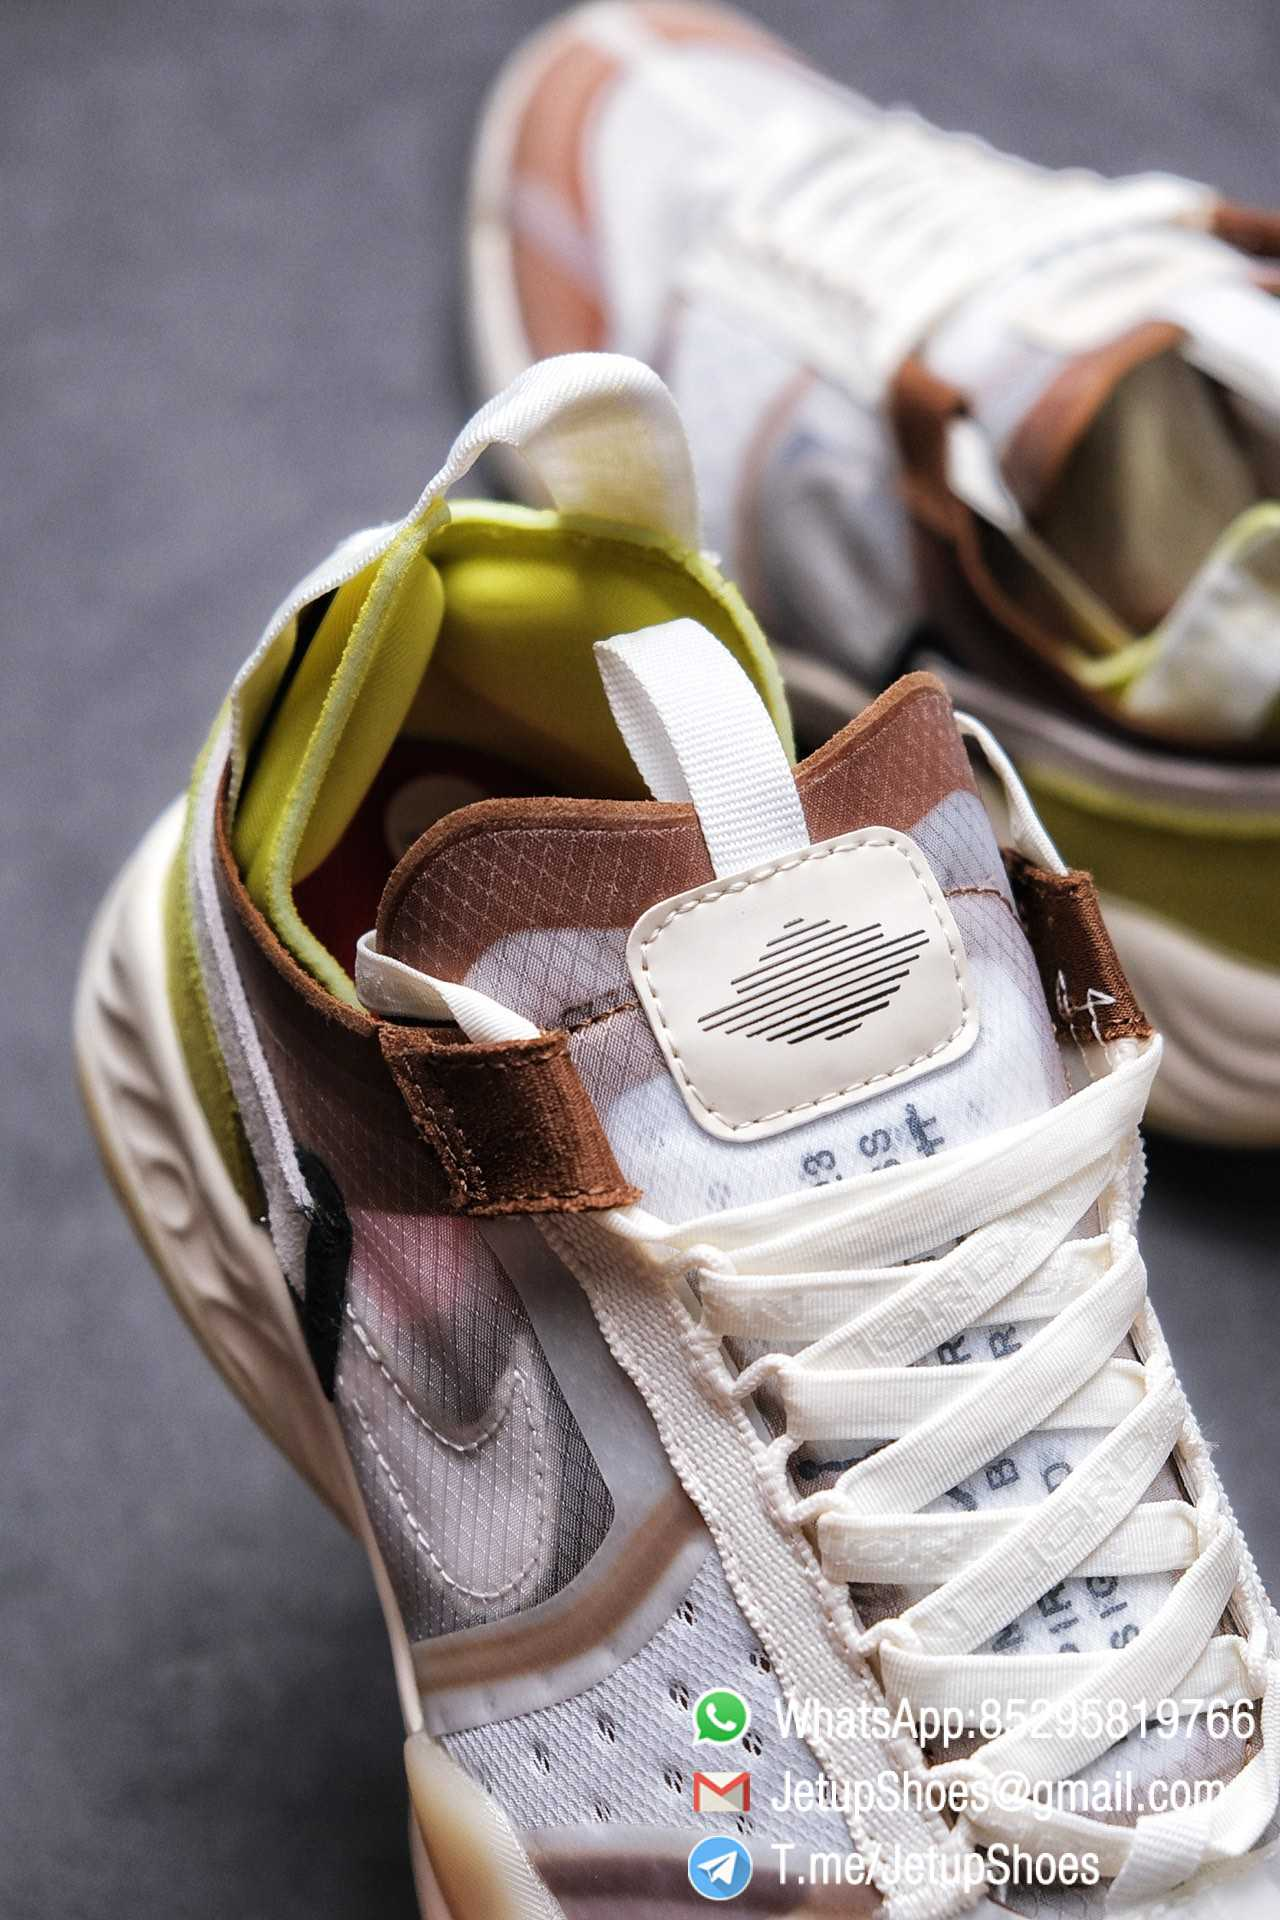 Best Replica Air Jordan Delta SP Sail Brown Light Green Running Shoes CW0783 104 Top Quality Sneakers Store 07